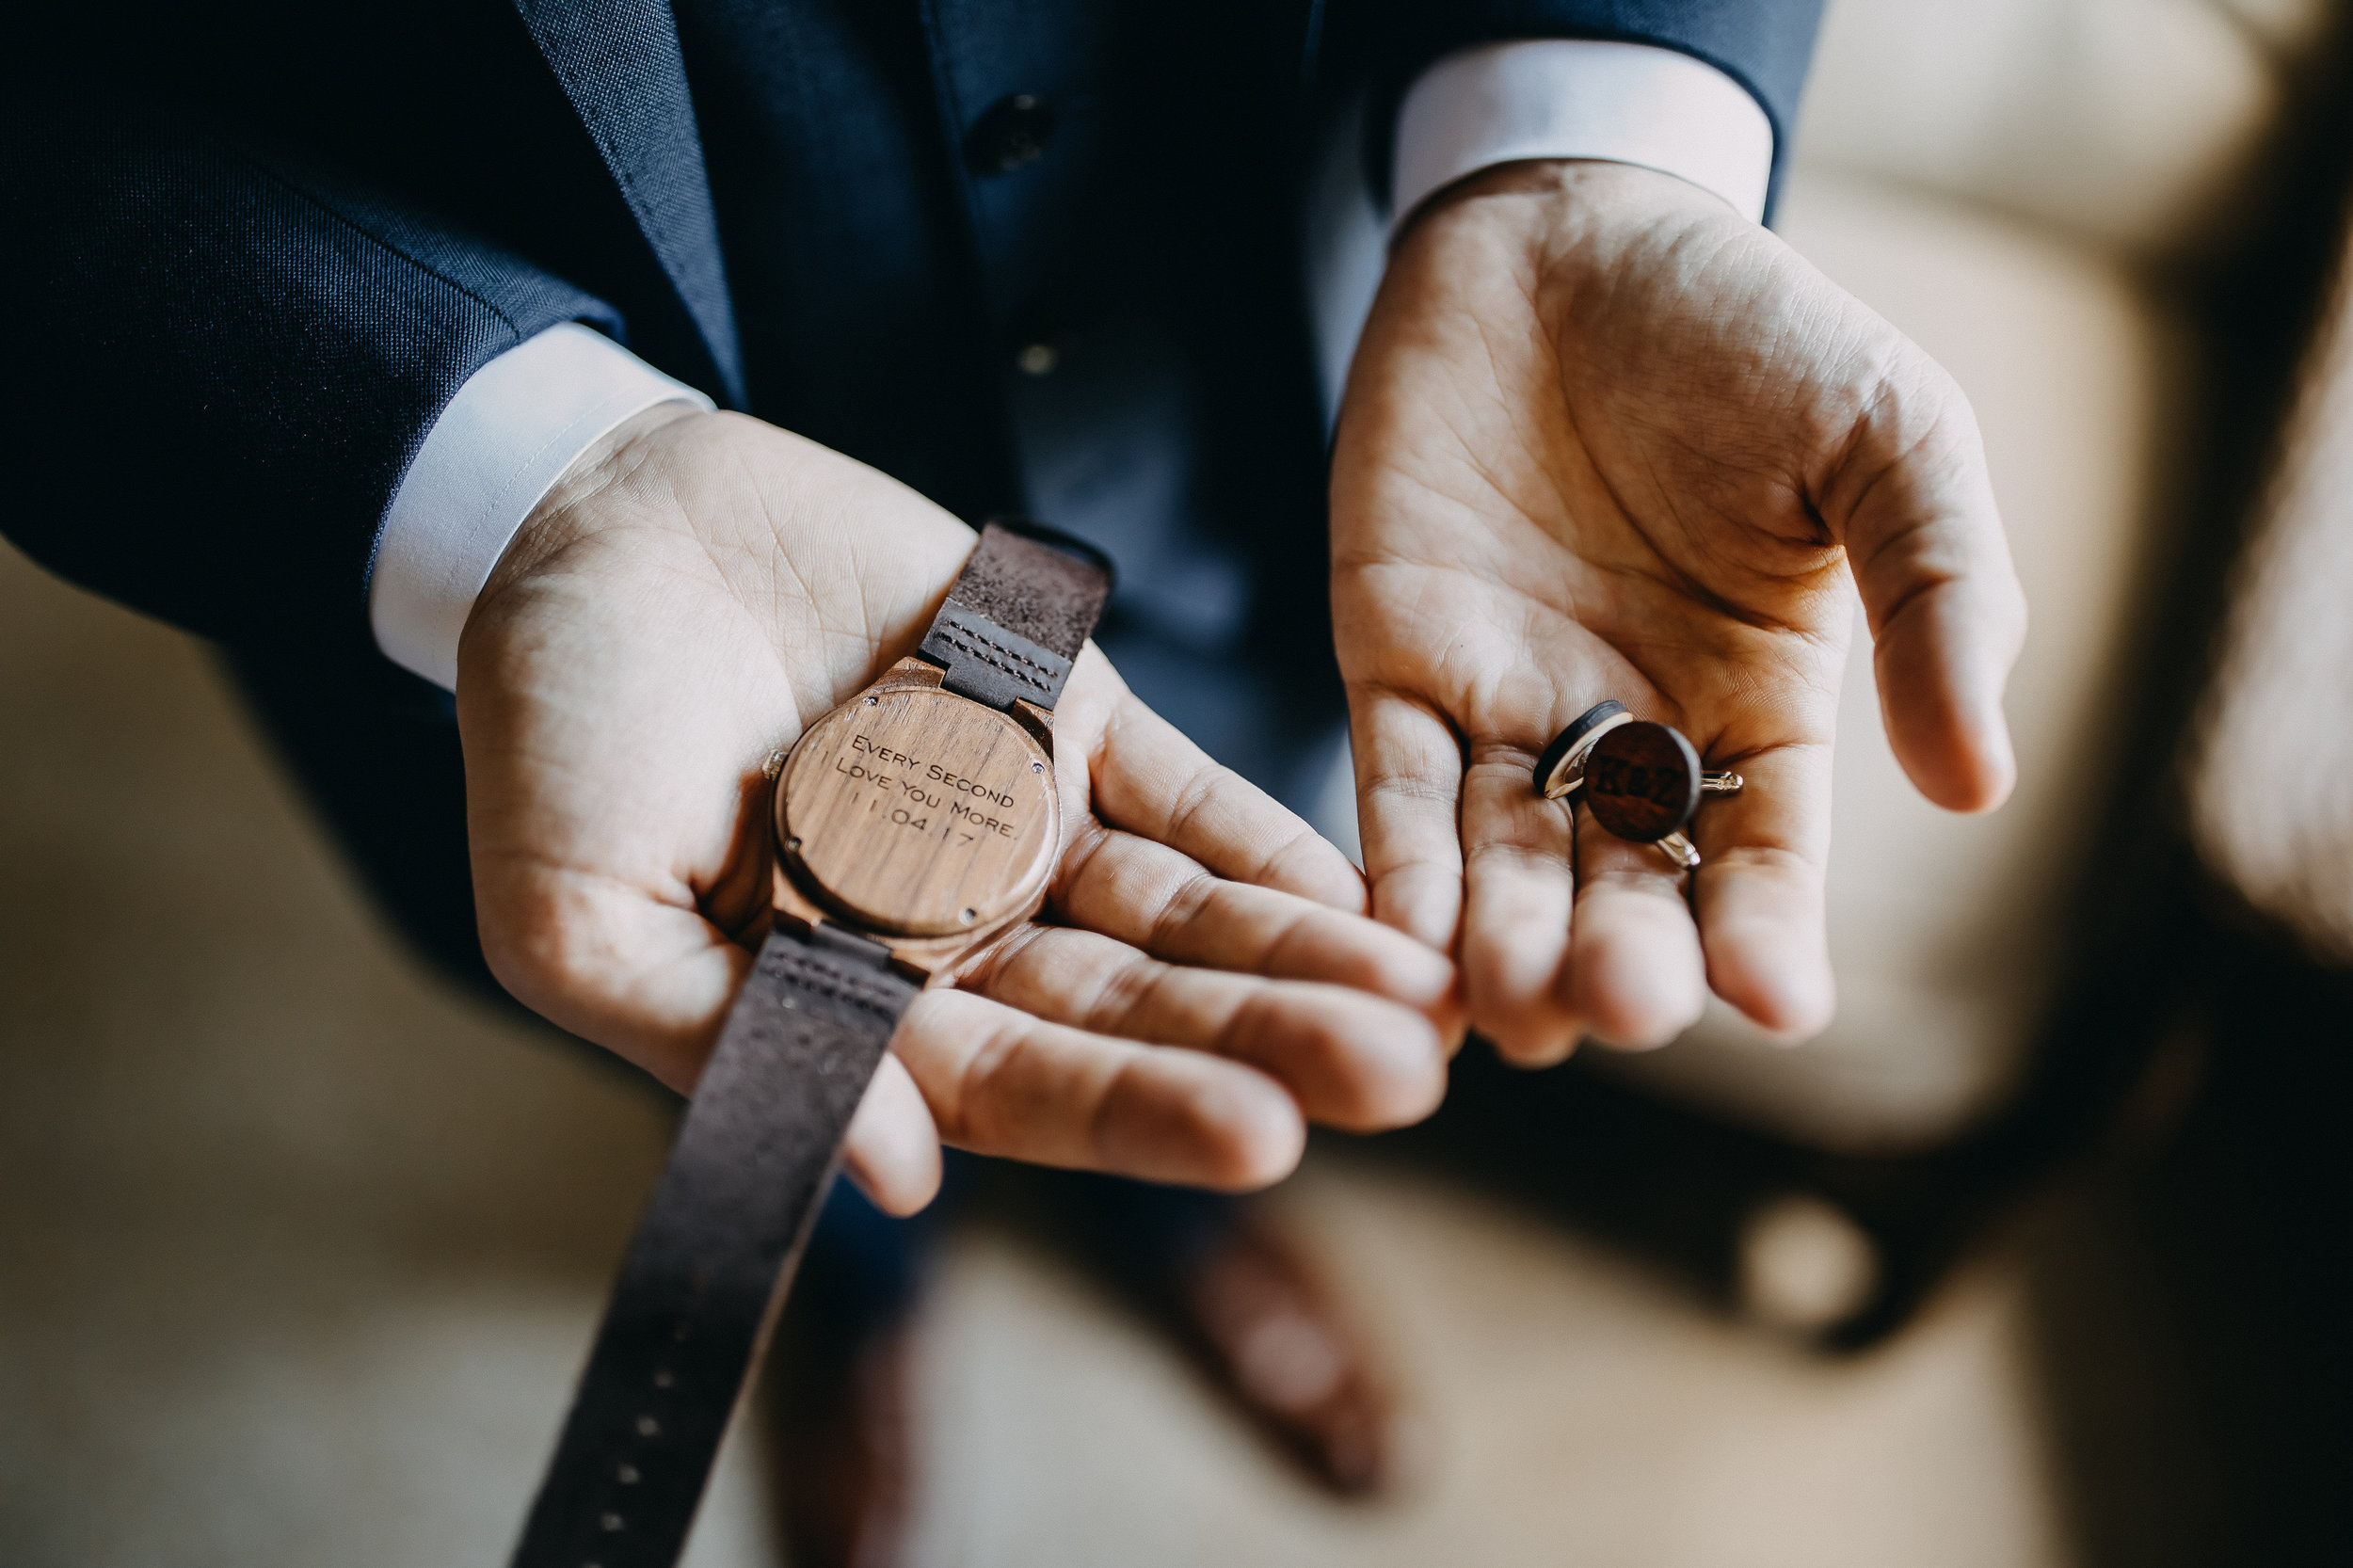 Engraved Wooden Groom Gift Watch - Florida Estate Wedding - Powel Crowley Estate Wedding